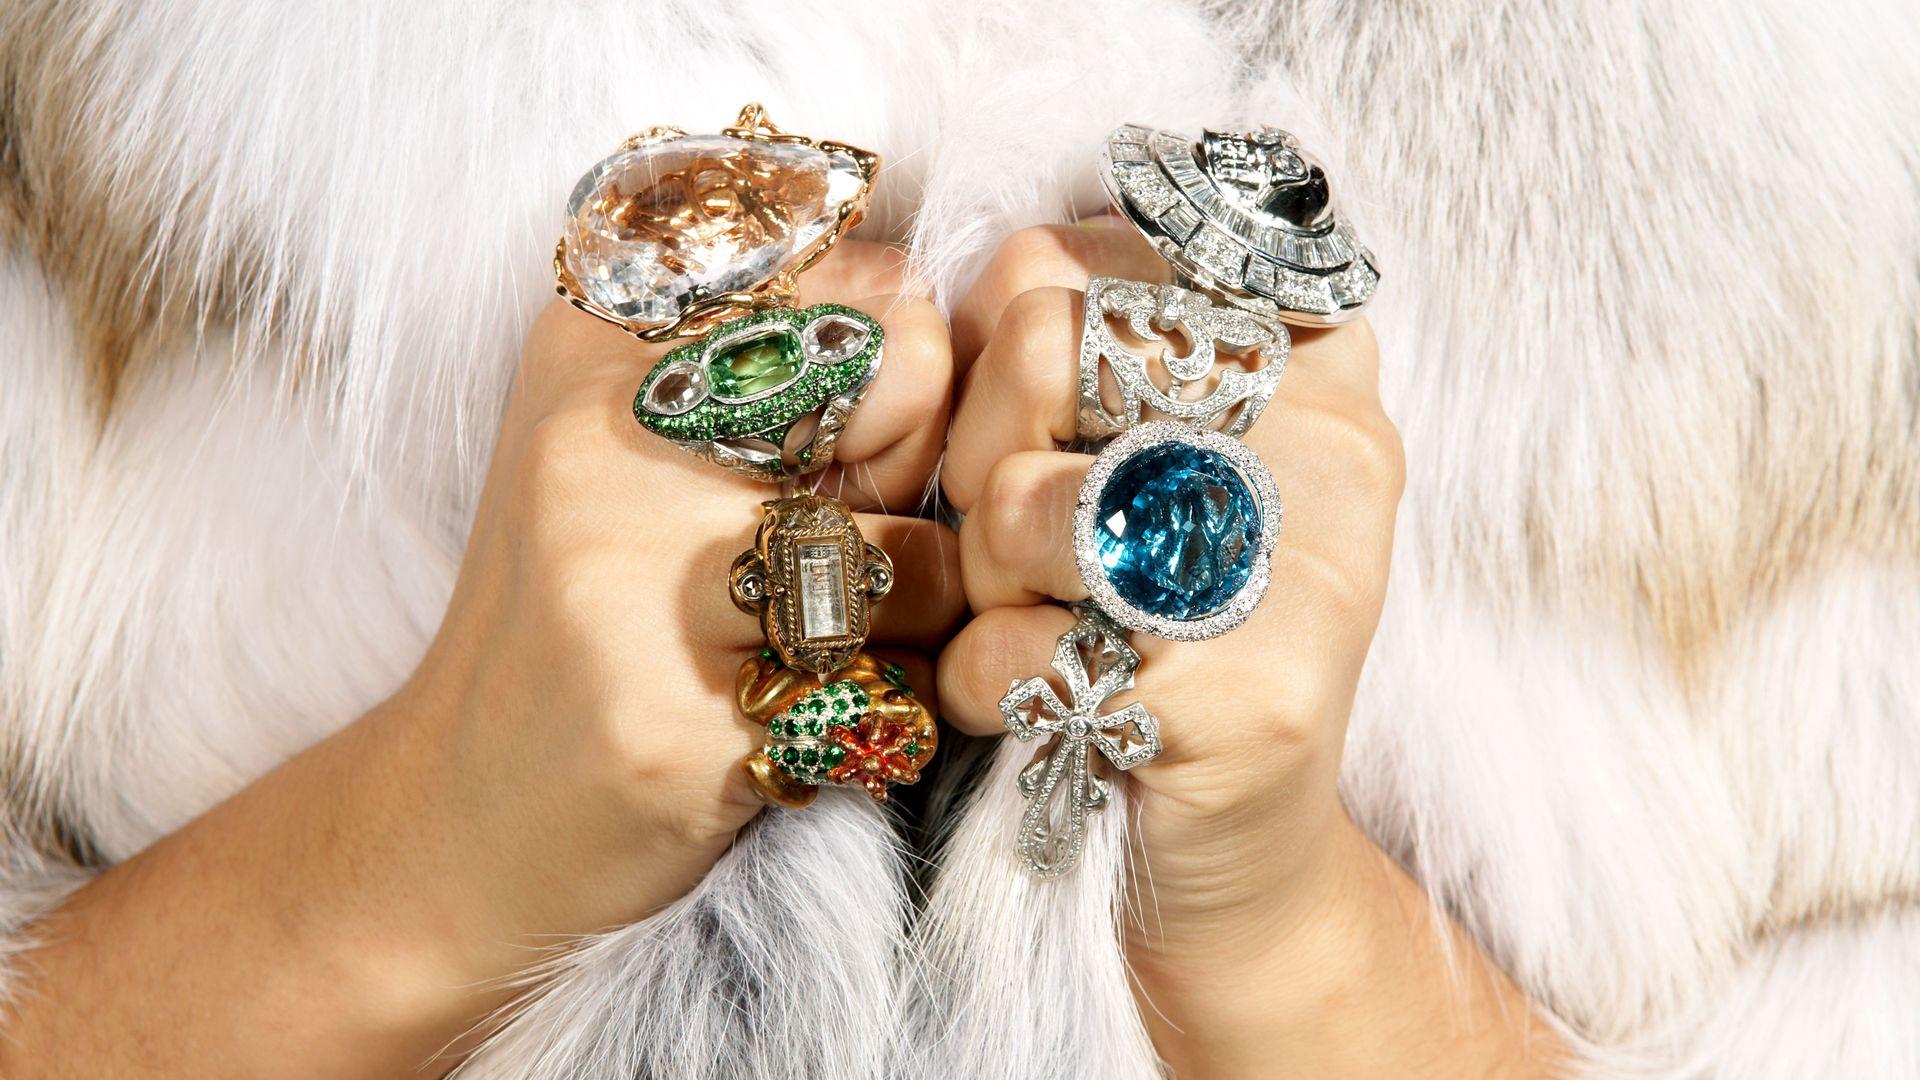 Una noia portant joies i diamants. Foto: Der Spiegel